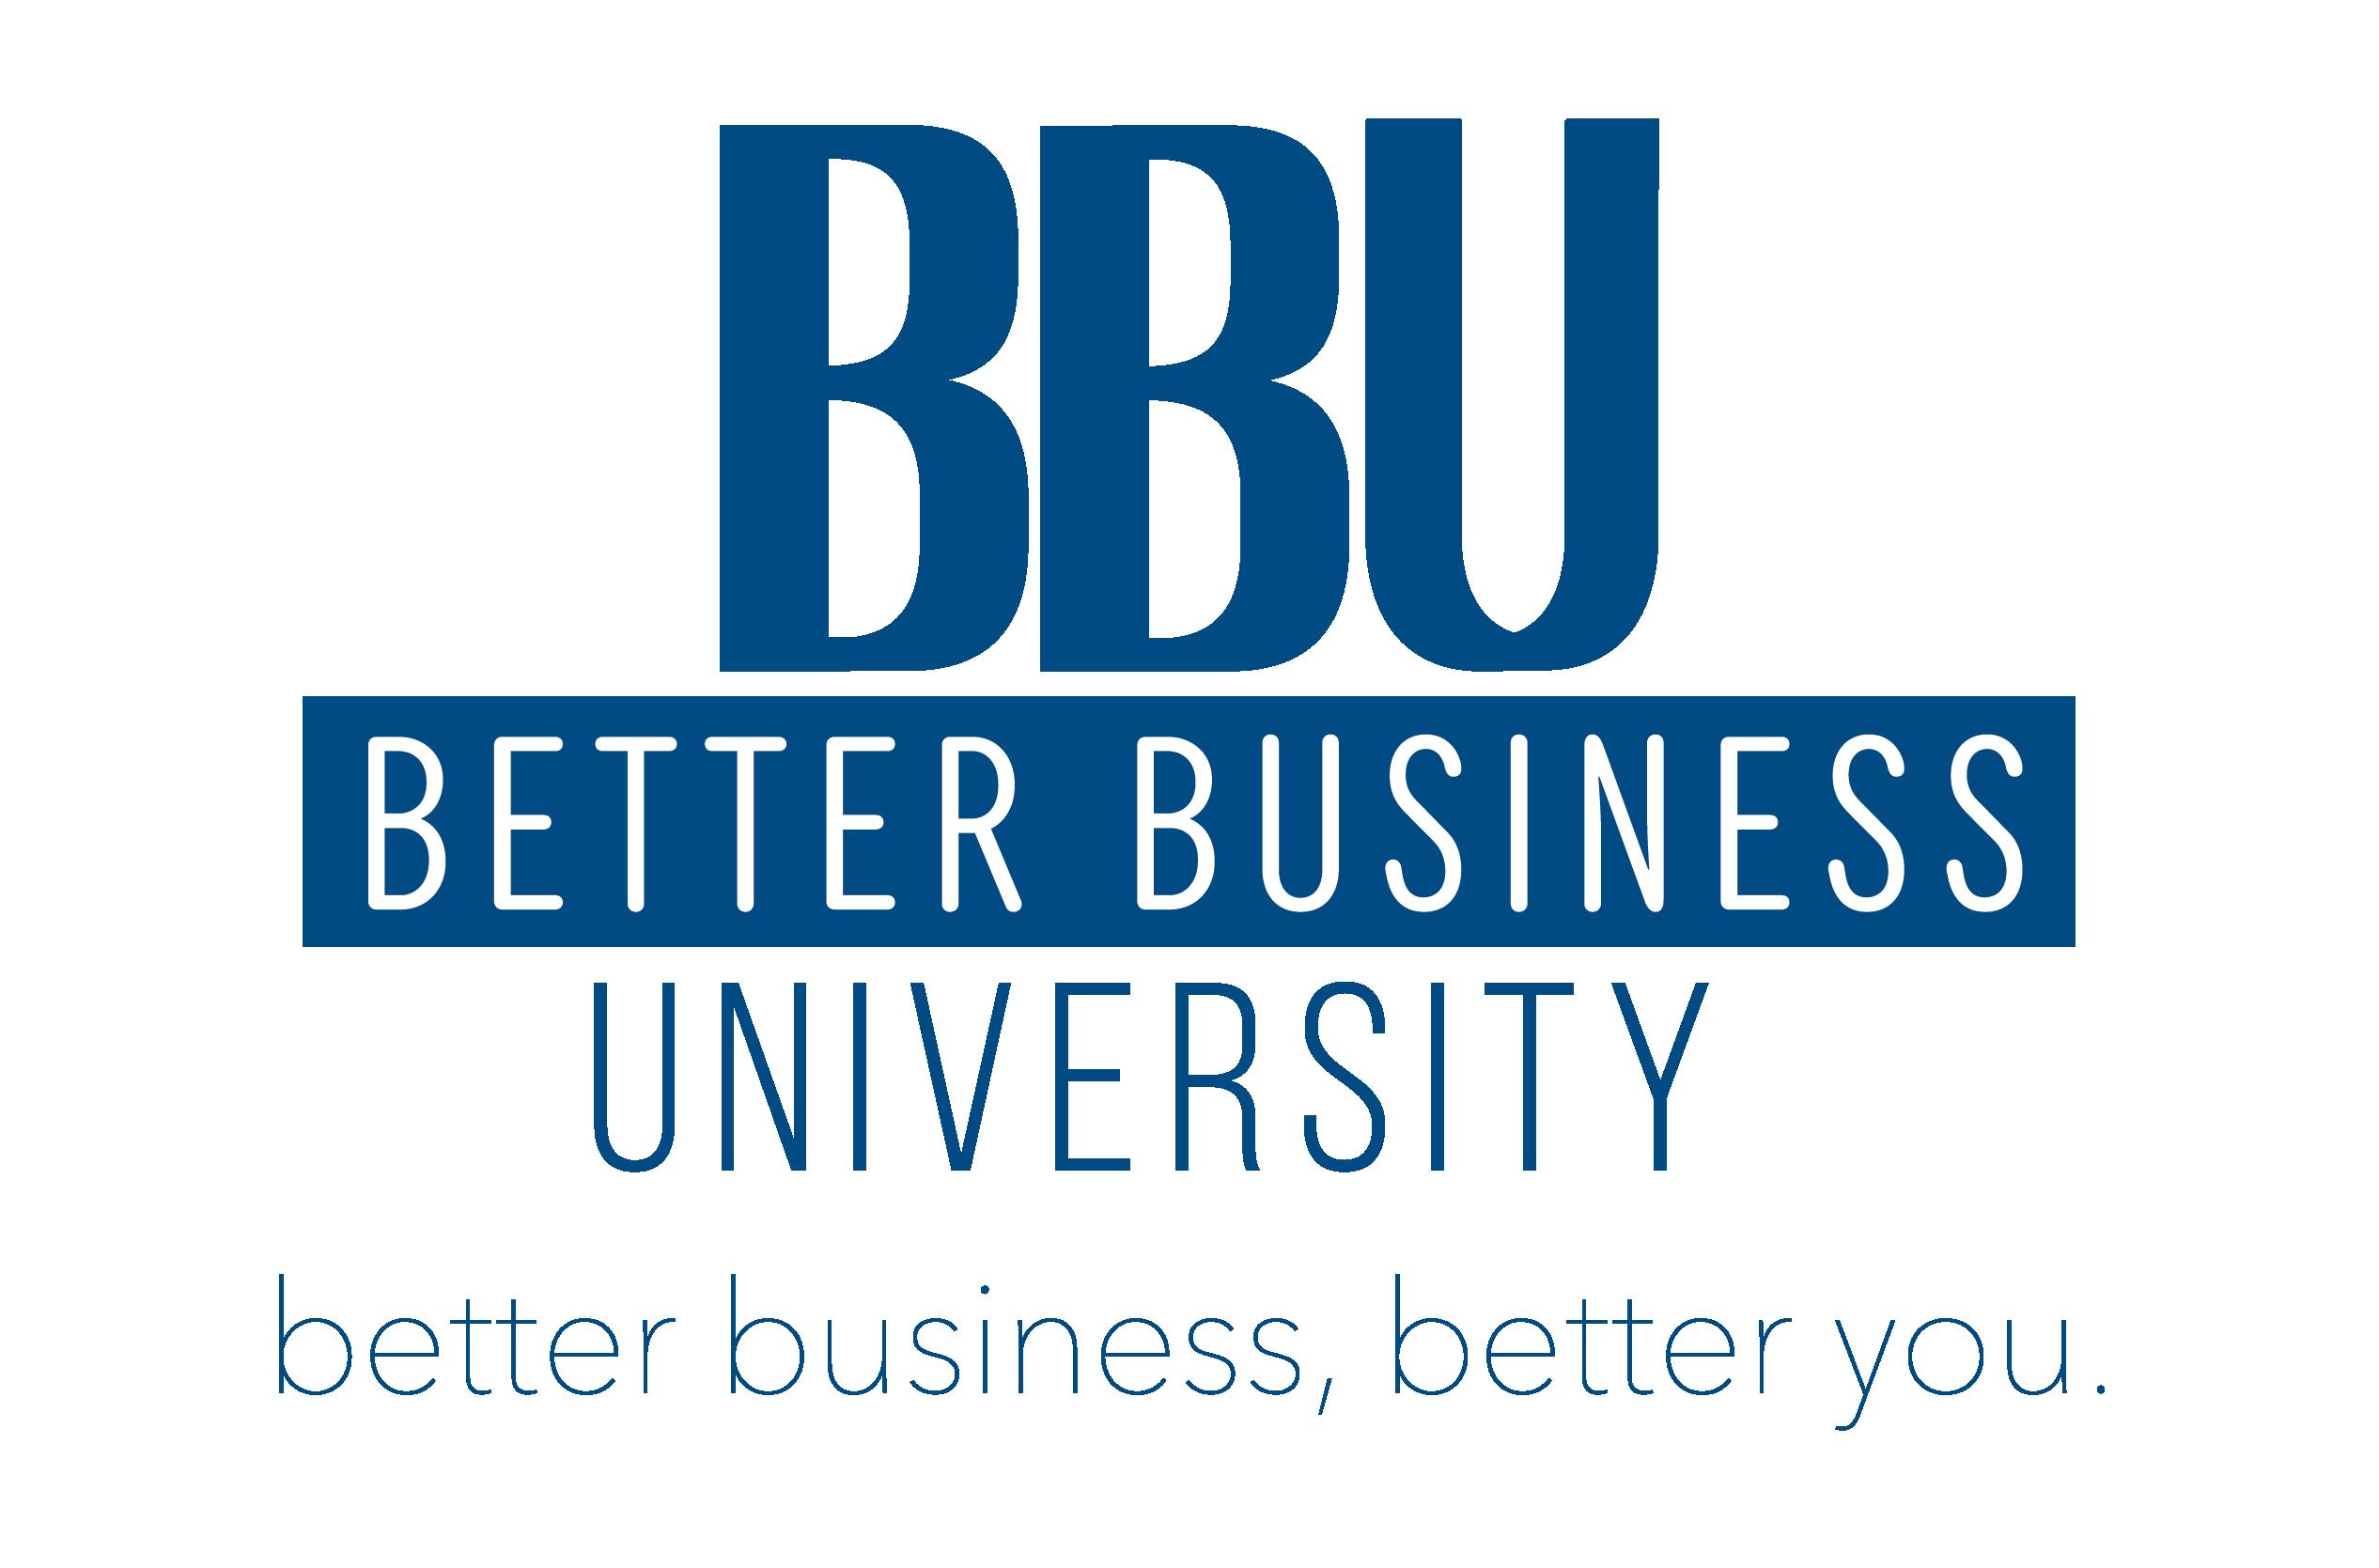 better business university